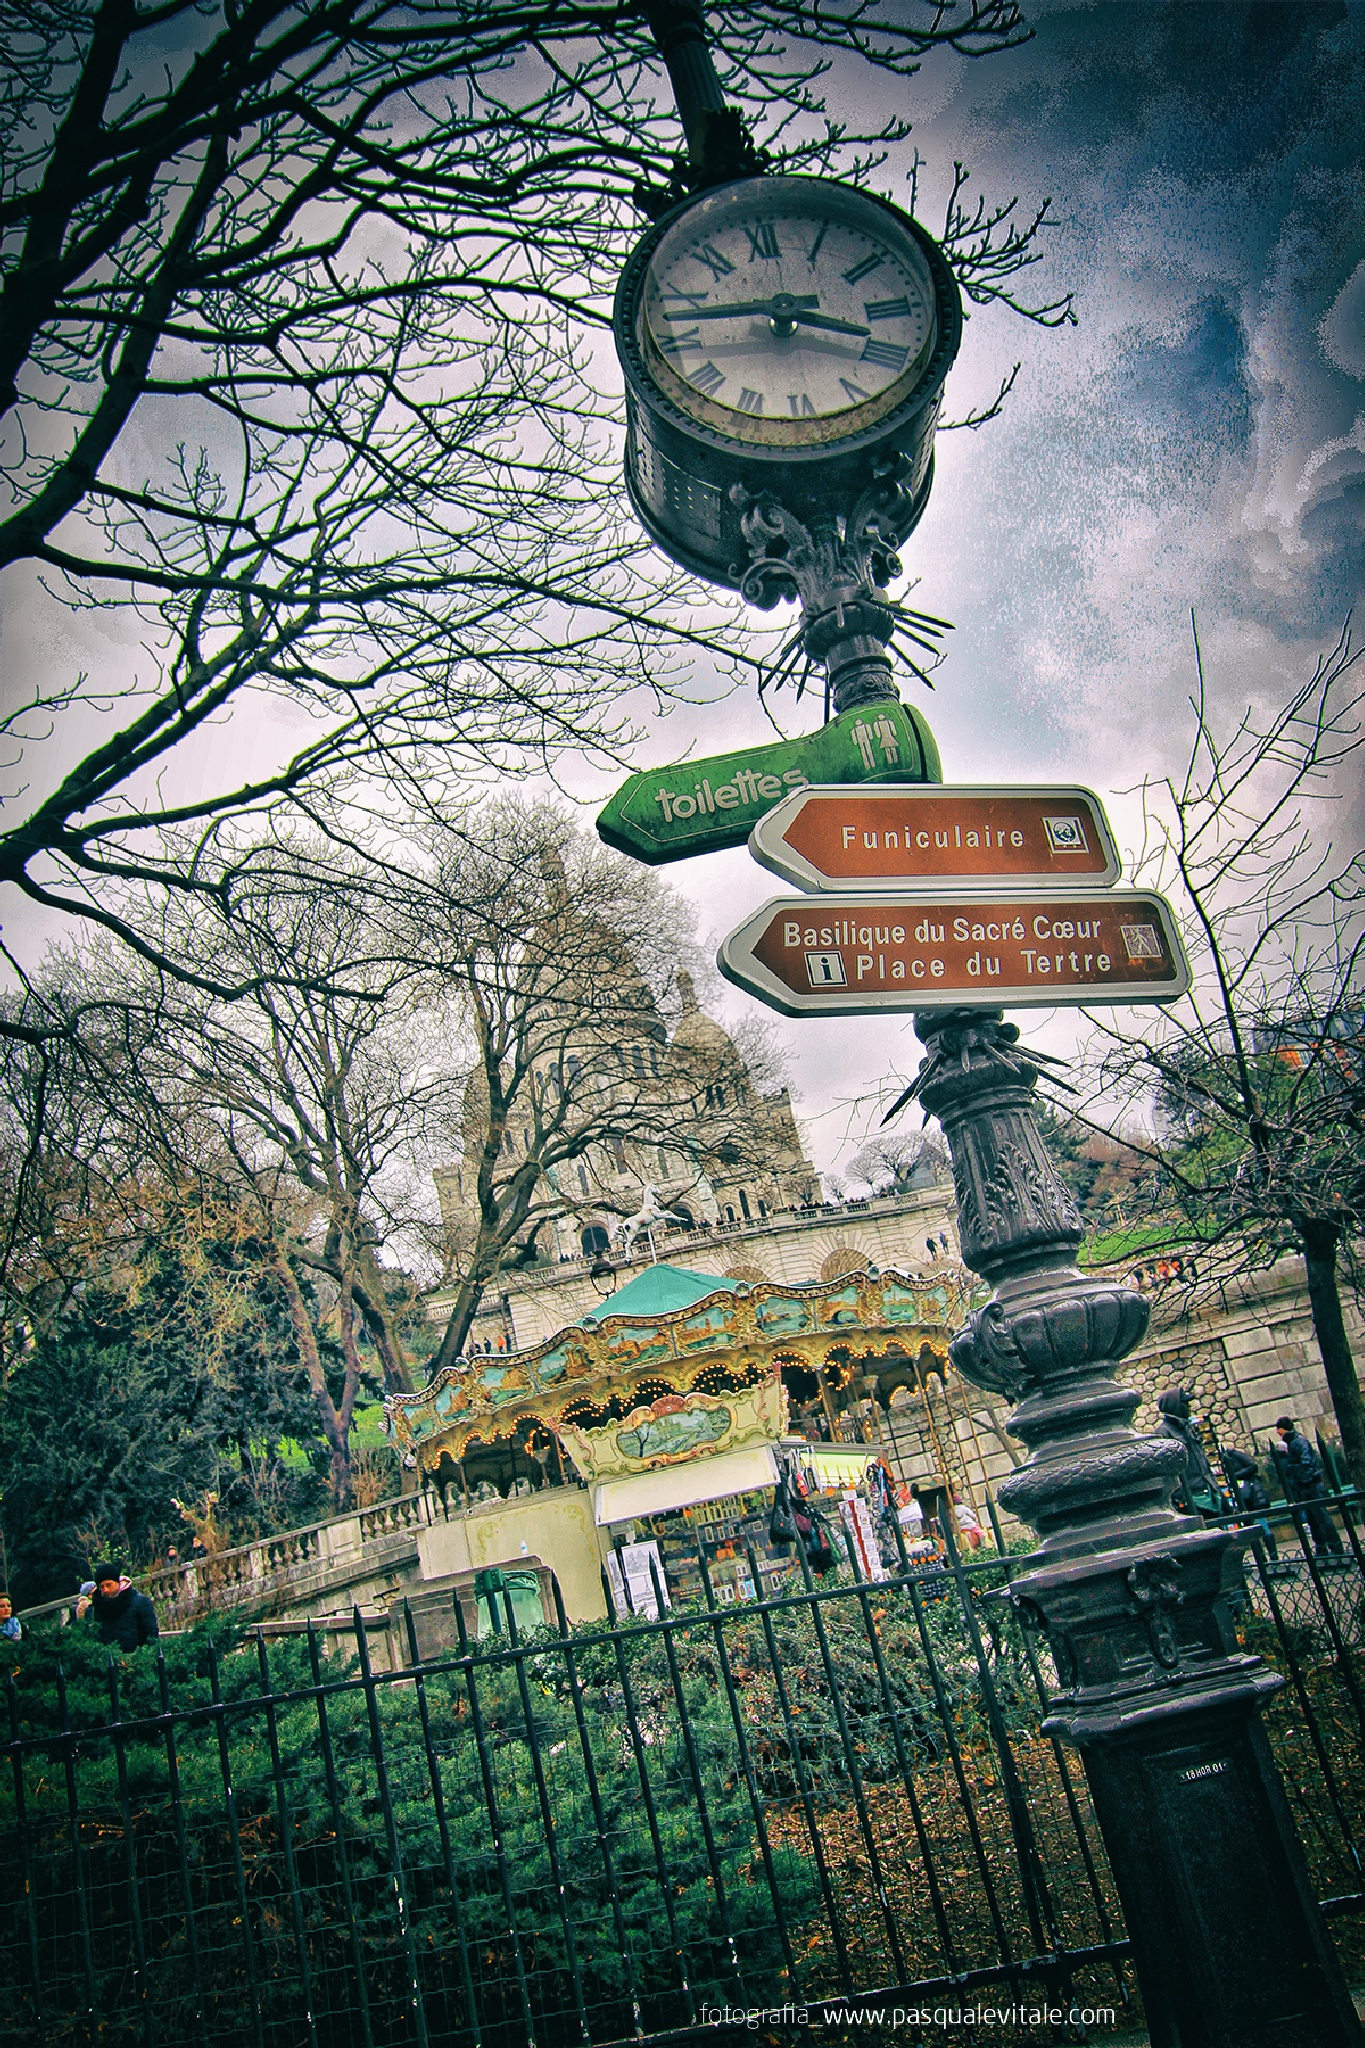 Montmartre by Pasquale Vitale